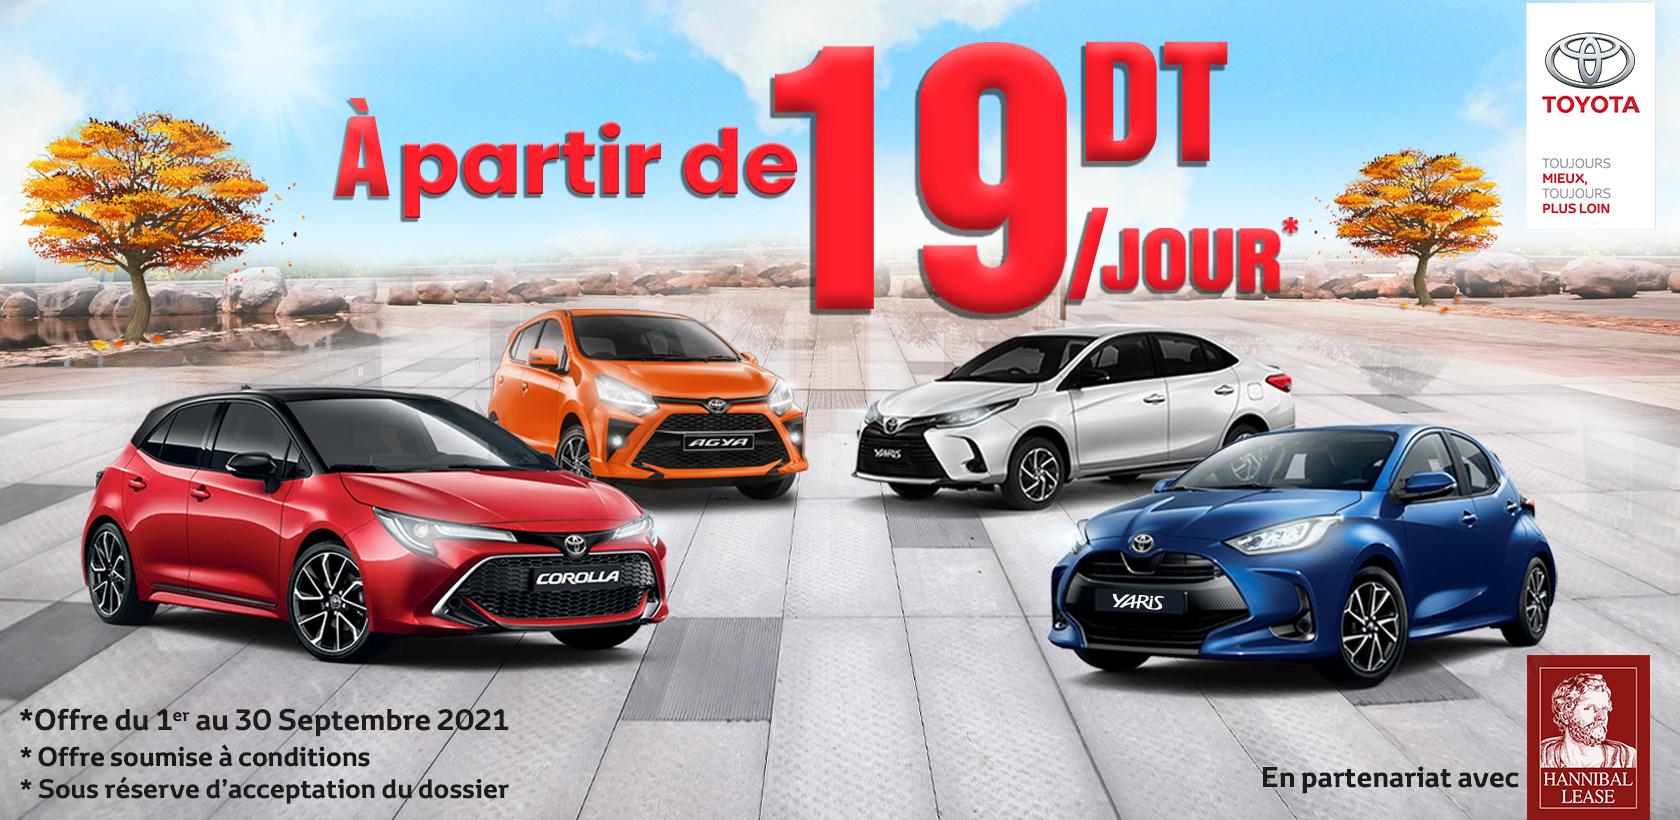 Toyota Tunisie & Hannibal Lease